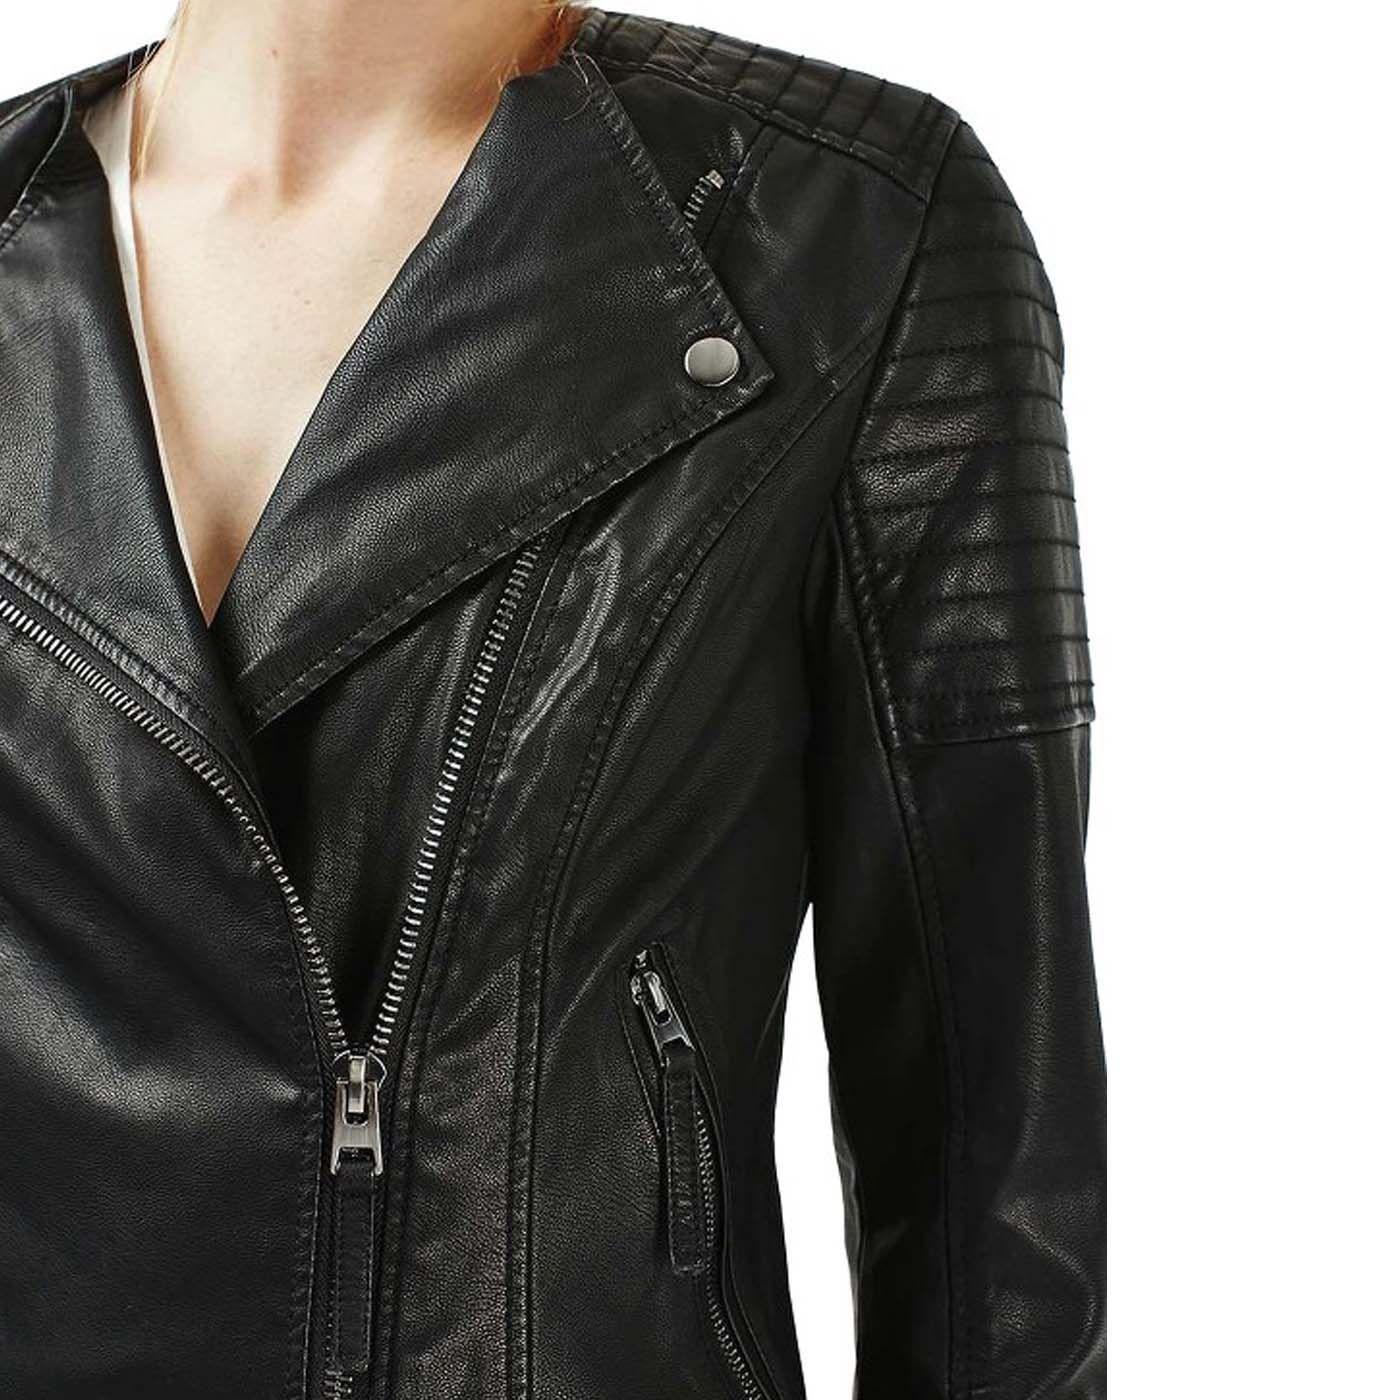 Black Womens Leather Motorcycle Jacket Leather